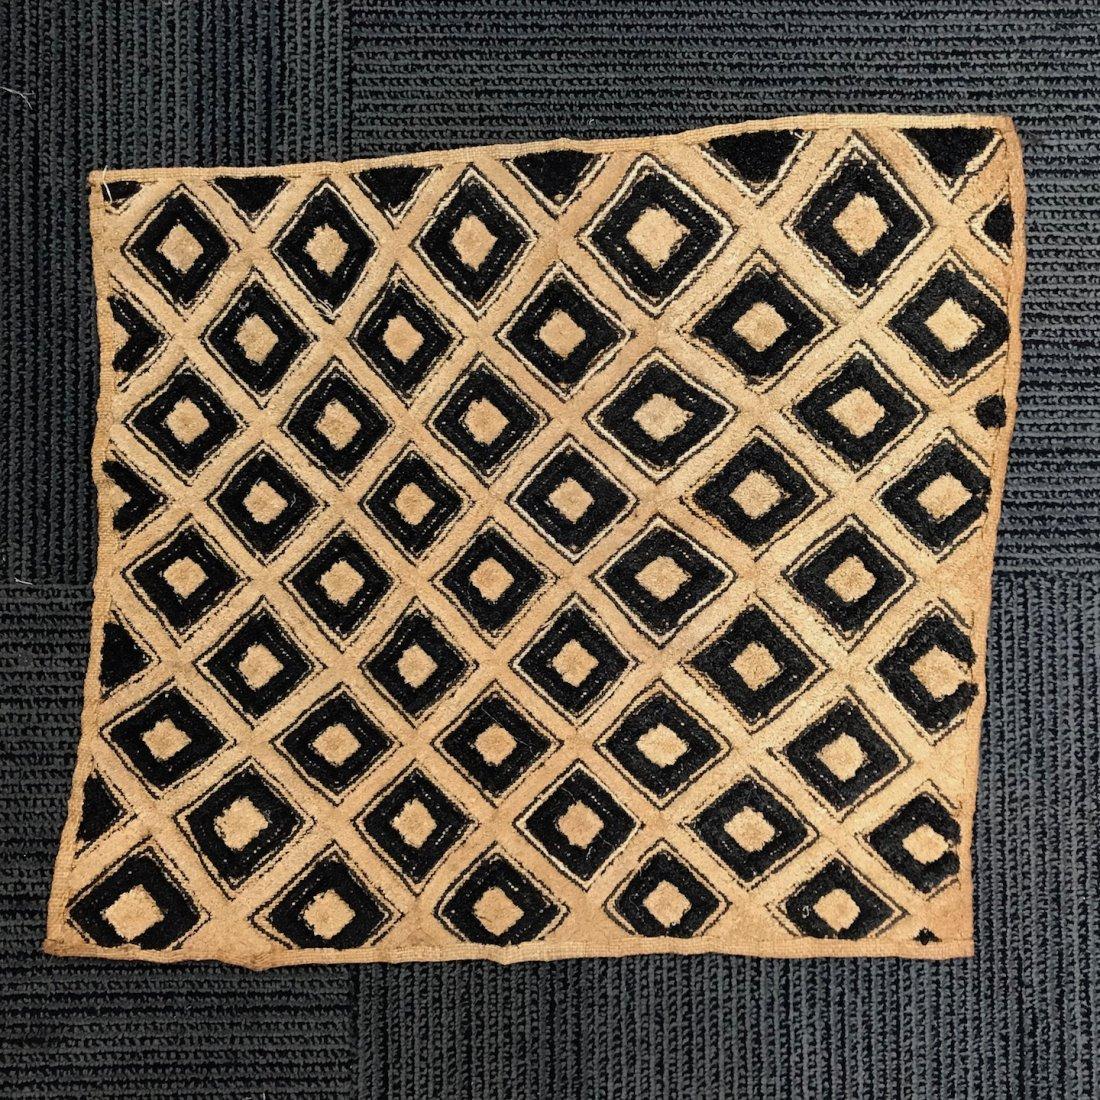 Kuba Cloth Kassai Shoowa